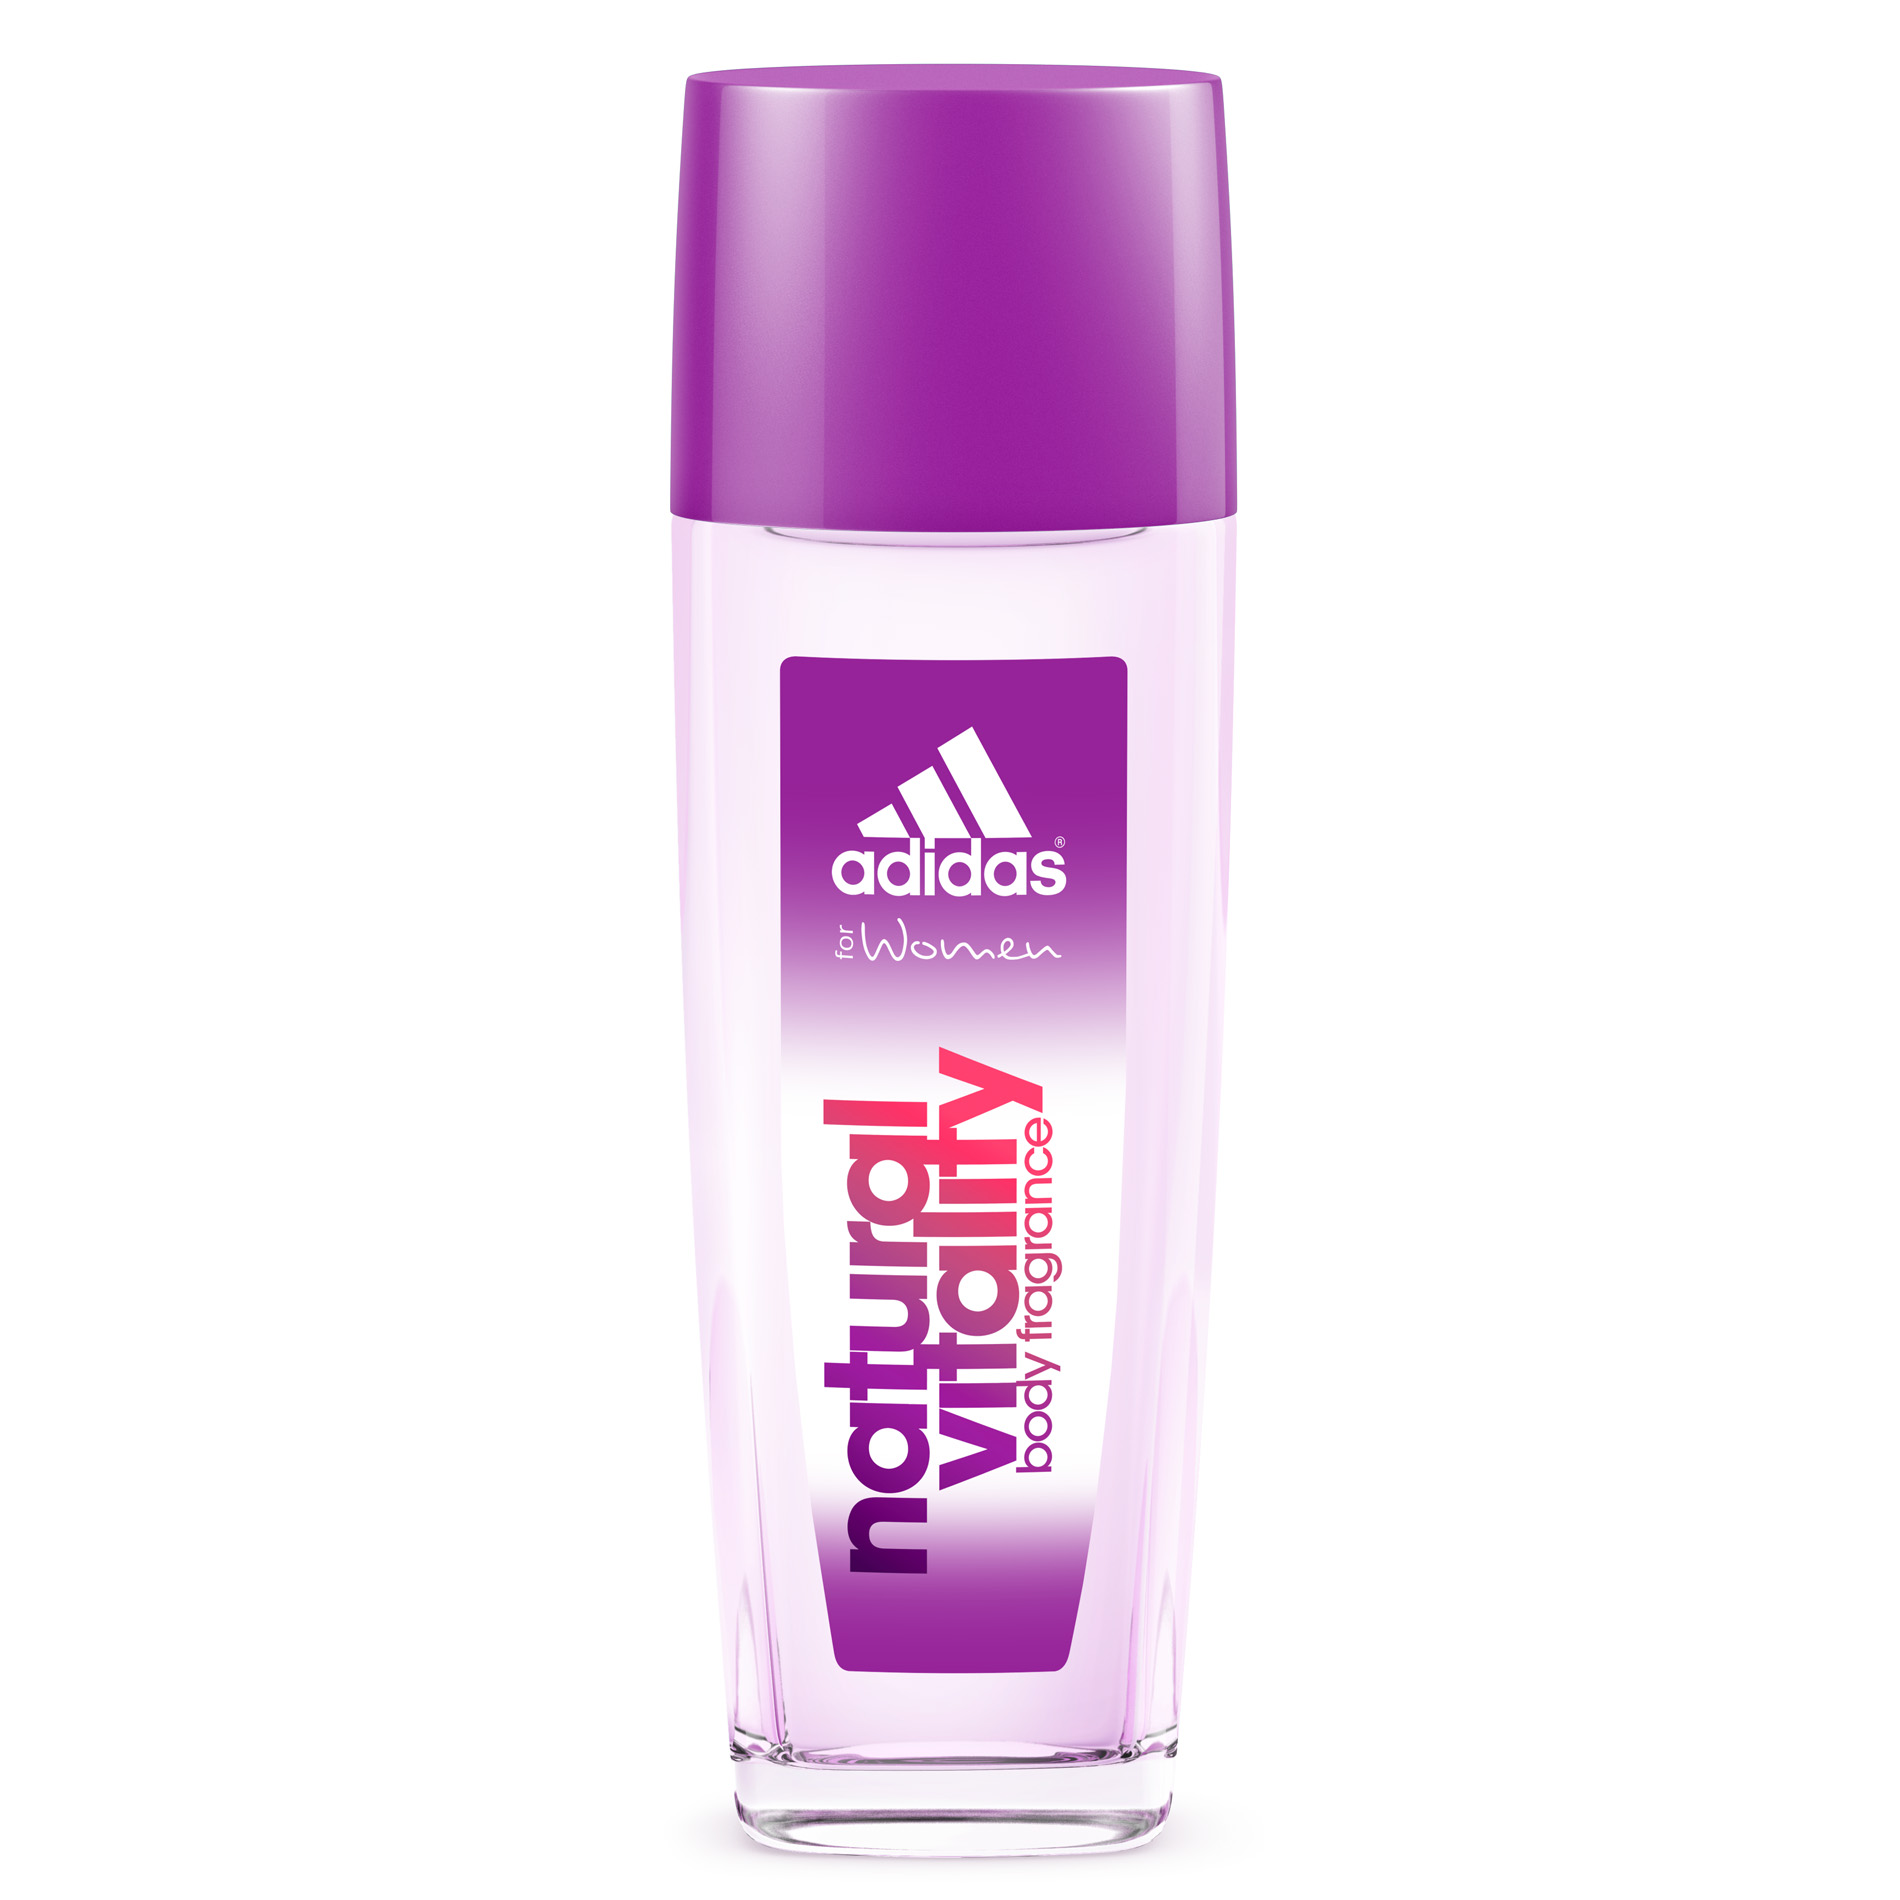 Adidas Fragrance Body Fragrance, Natural Vitality, 2.5 Oz. PartNumber: 015W007909700001P KsnValue: 015W007909700001 MfgPartNumber: 31983907000